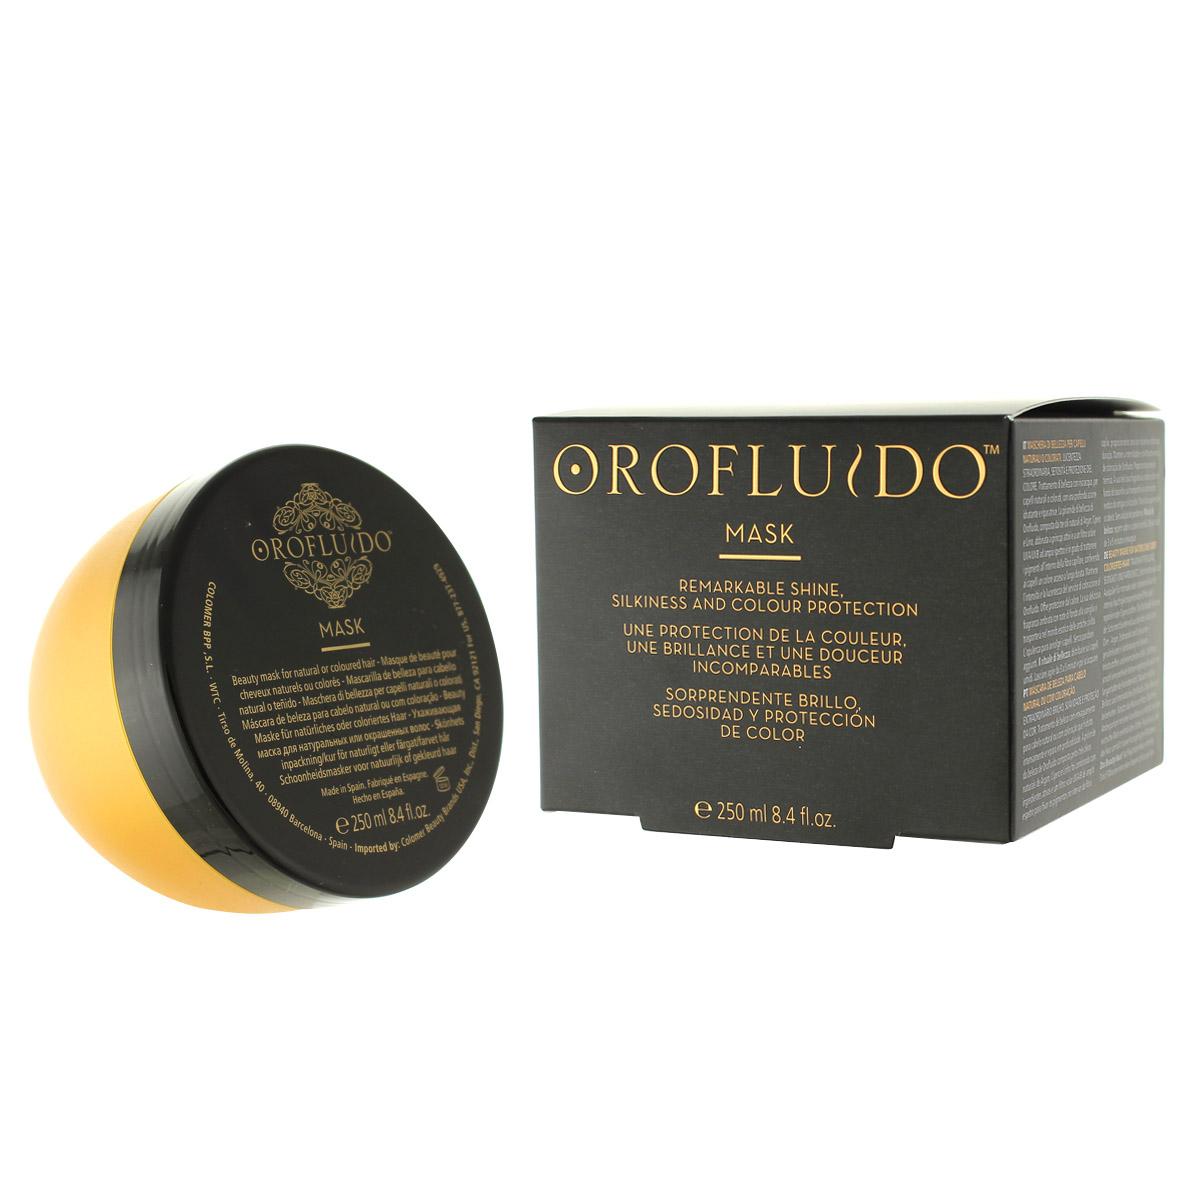 Orofluido(TM) Orofluido Mask 250 ml 70555